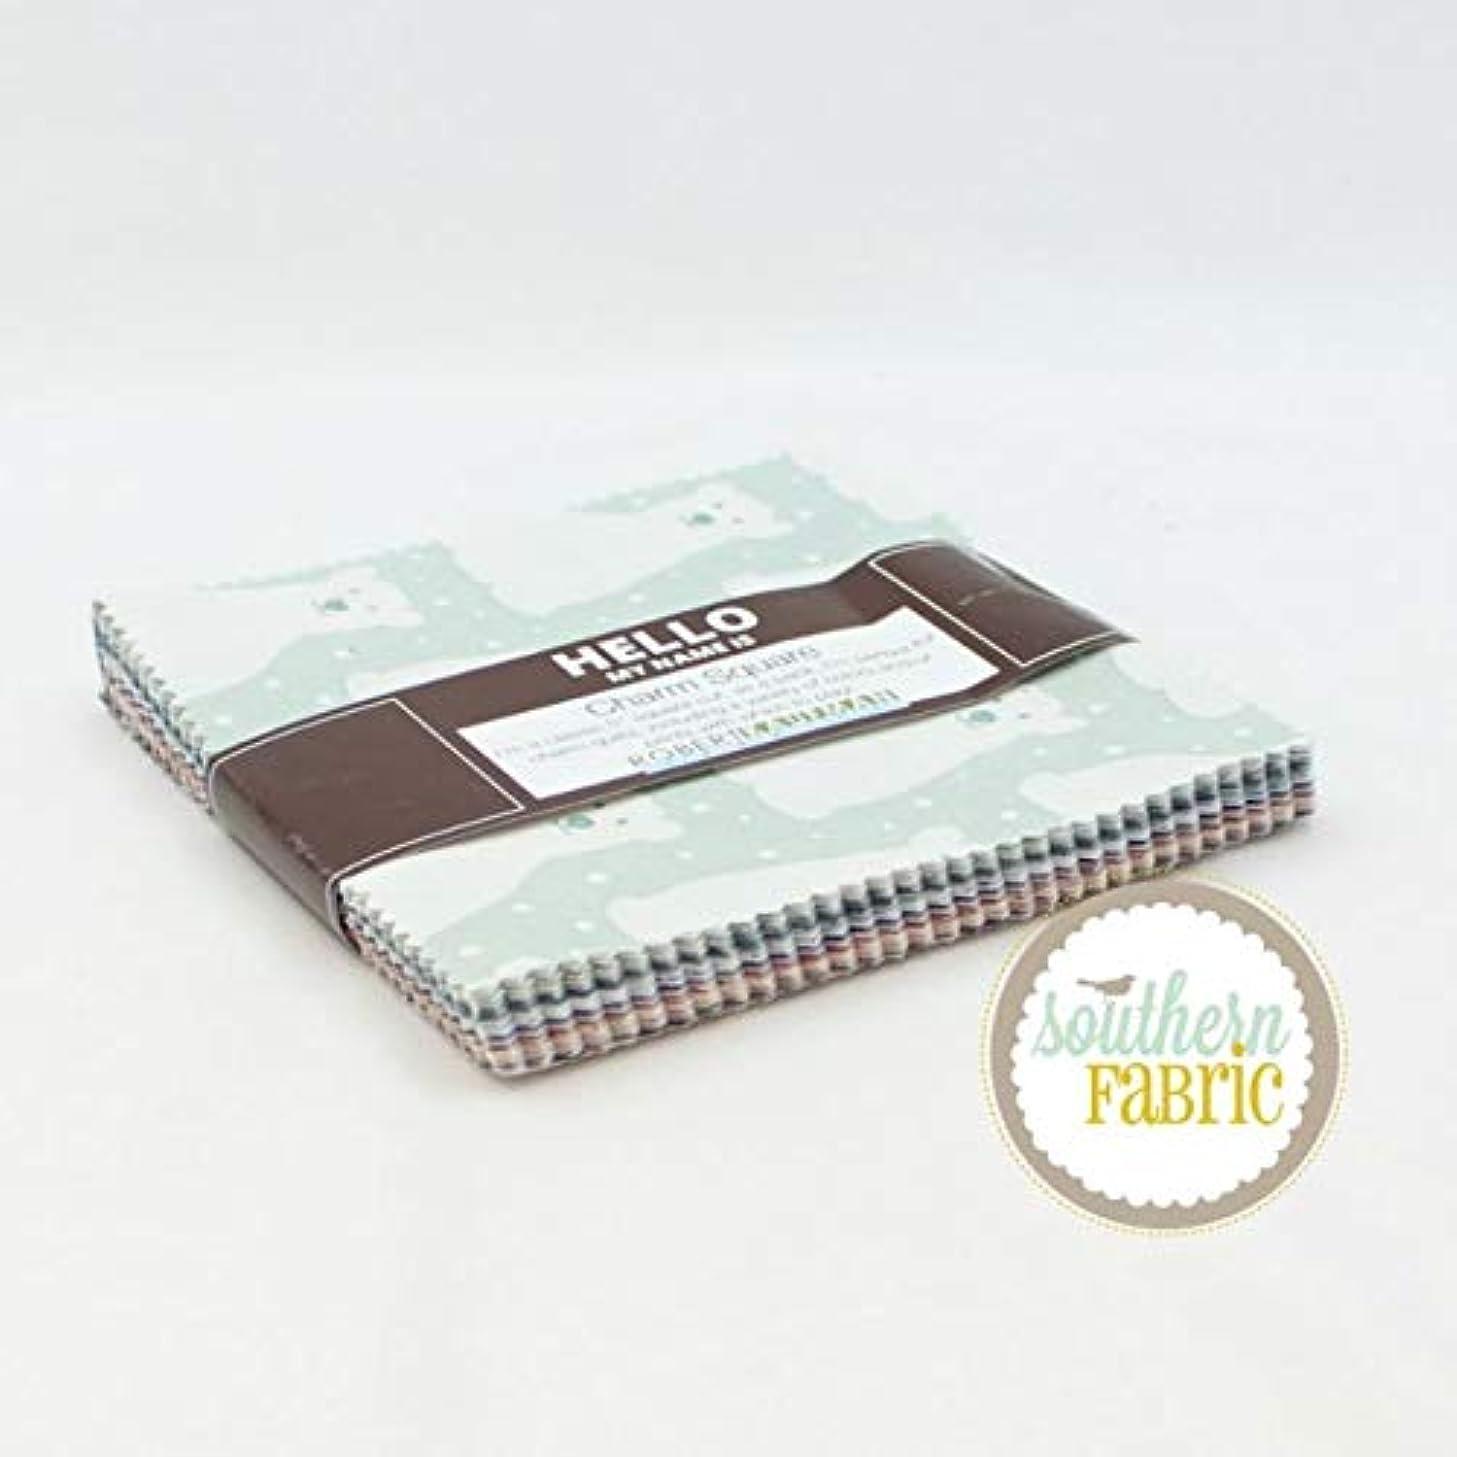 Robert Kaufman Arctic Charm Pack (42 pcs) by Elizabeth Hartman 5 x 5 inches (12.7cm x 12.7cm) Fabric Squares DIY Quilt Fabric